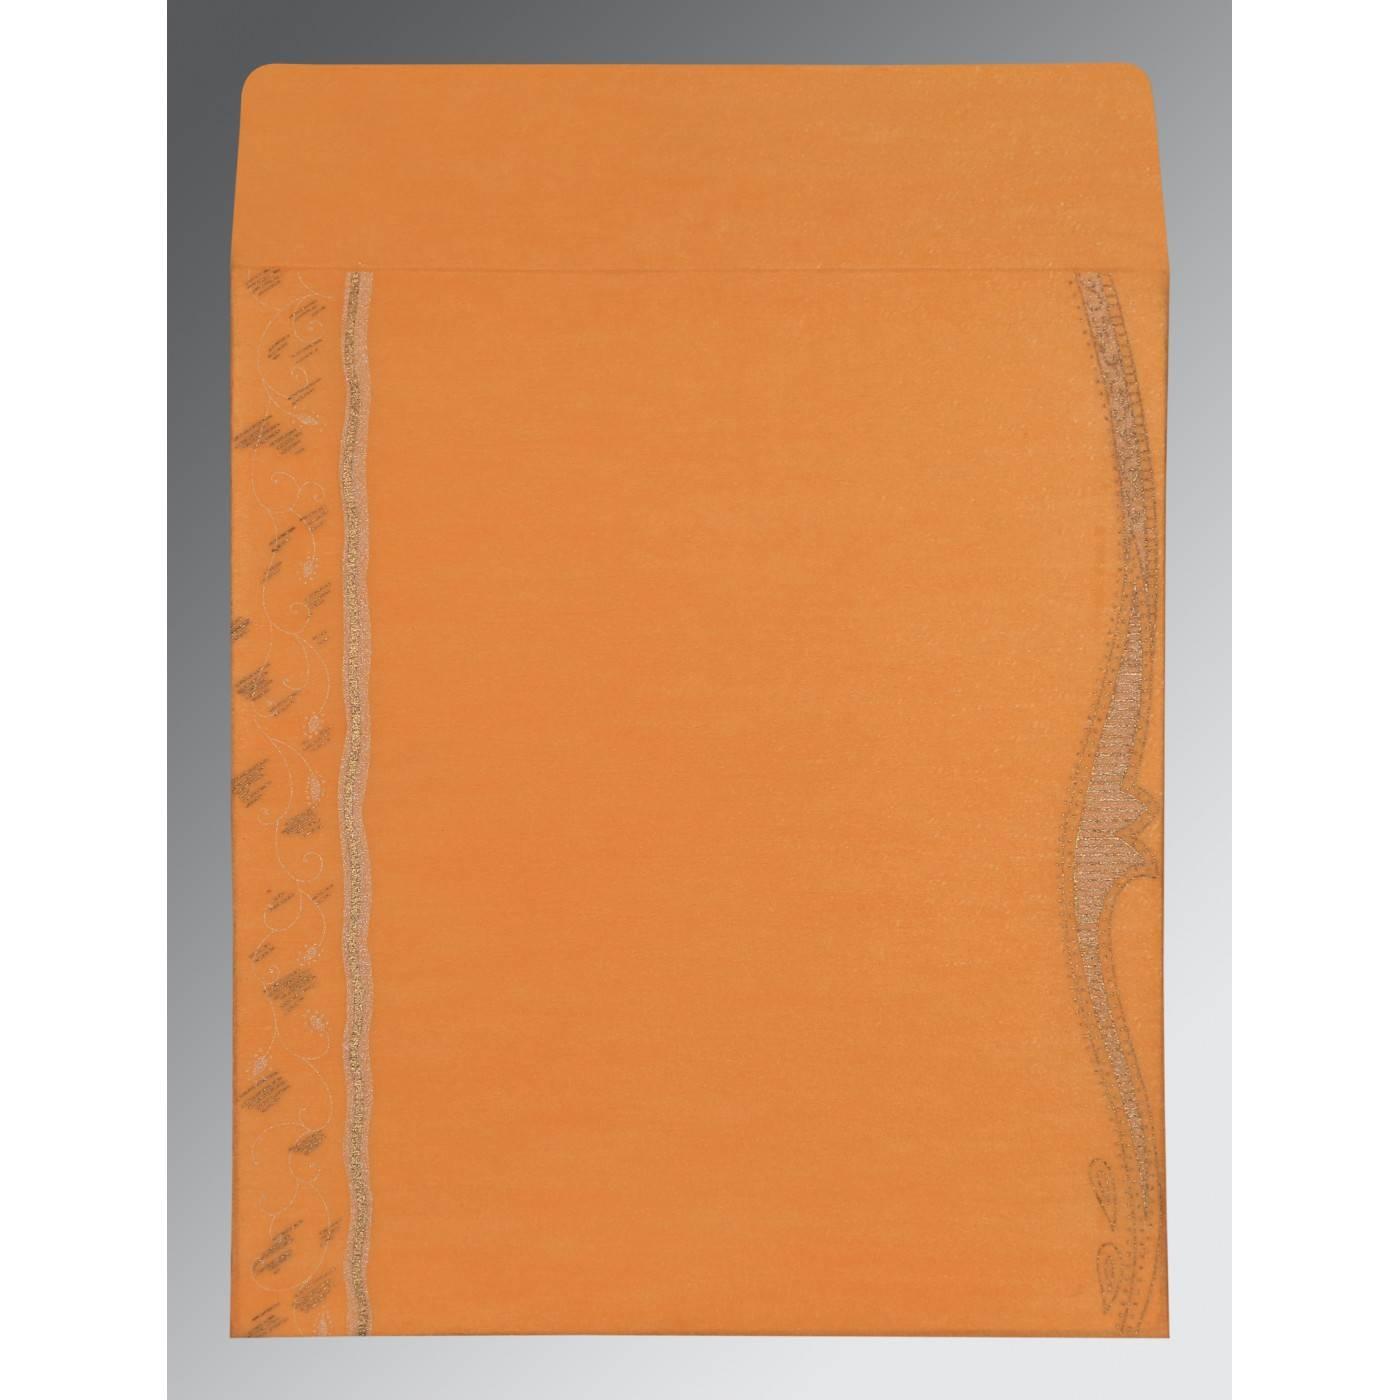 LIGHT ORANGE SHIMMERY EMBOSSED WEDDING CARD : CW-8210L - IndianWeddingCards